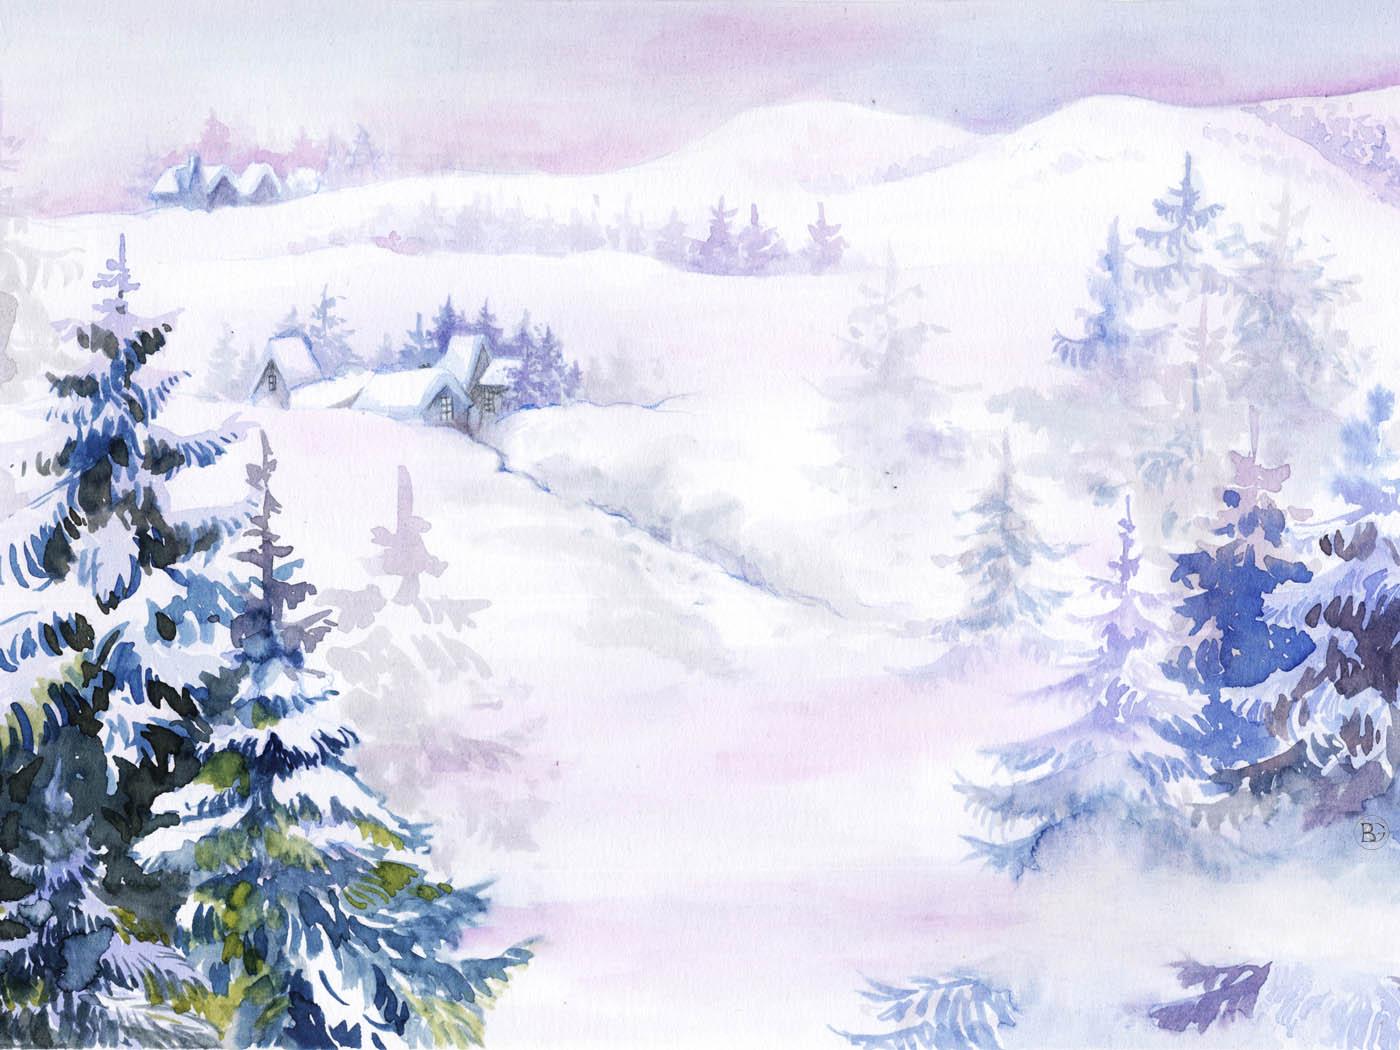 winter 108 hintergrundbild gratis - photo #26